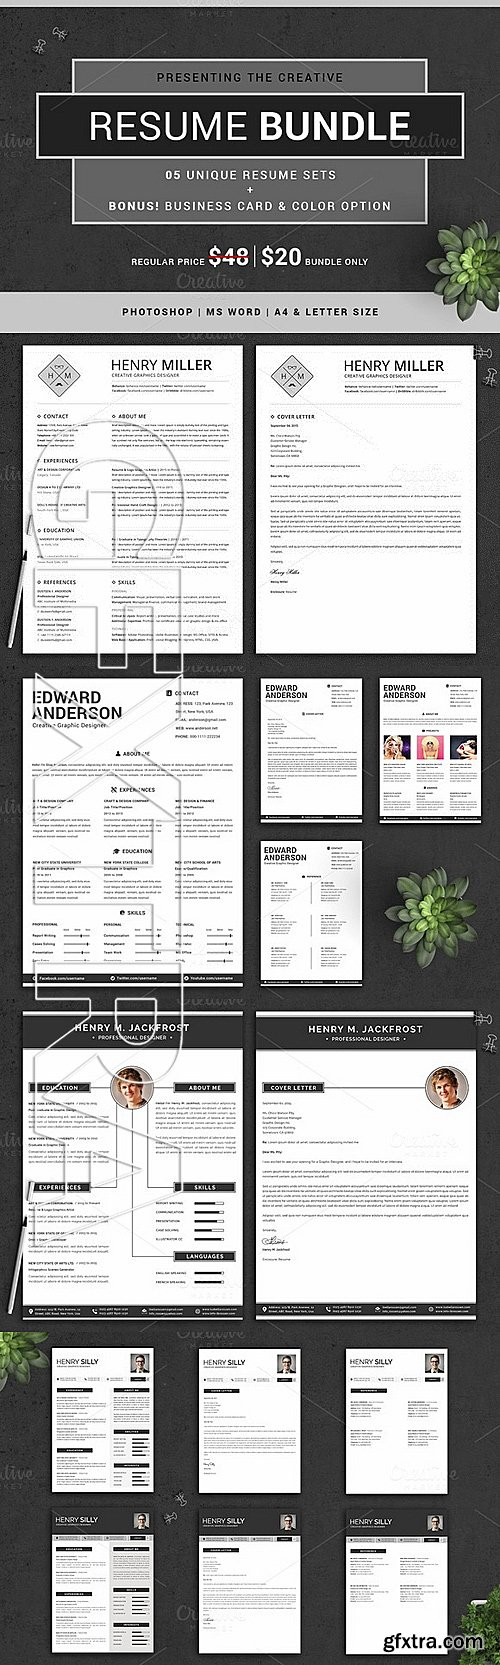 CM - The Creative Resume Bundle 336190